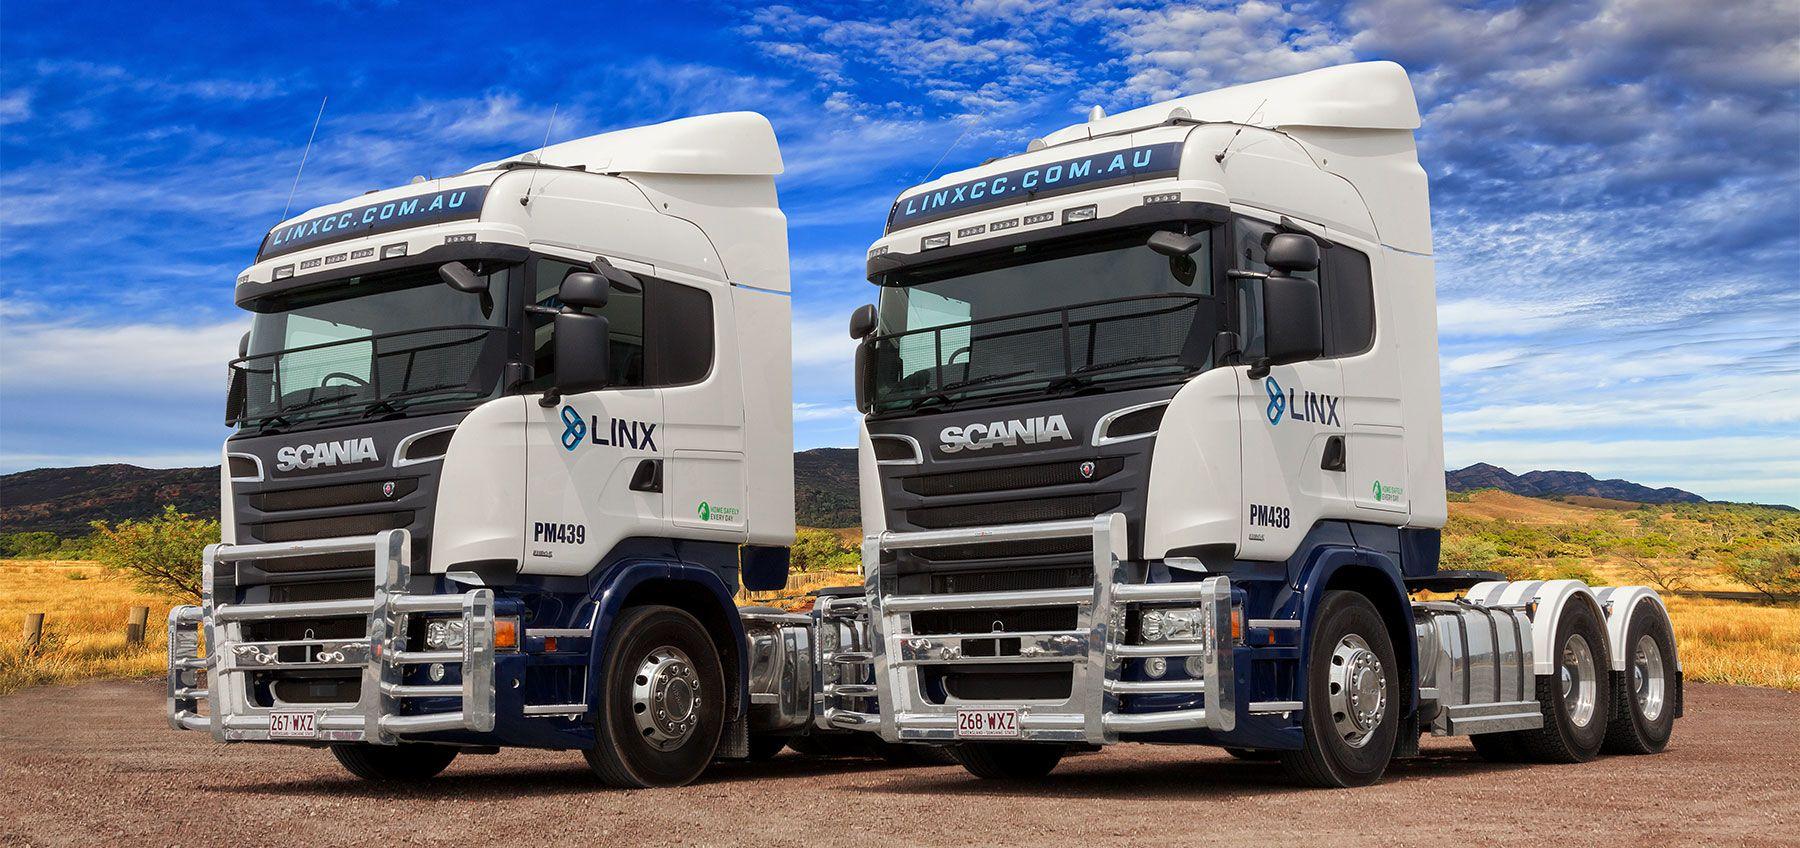 LINX Cargo Care Group Scania Trucks